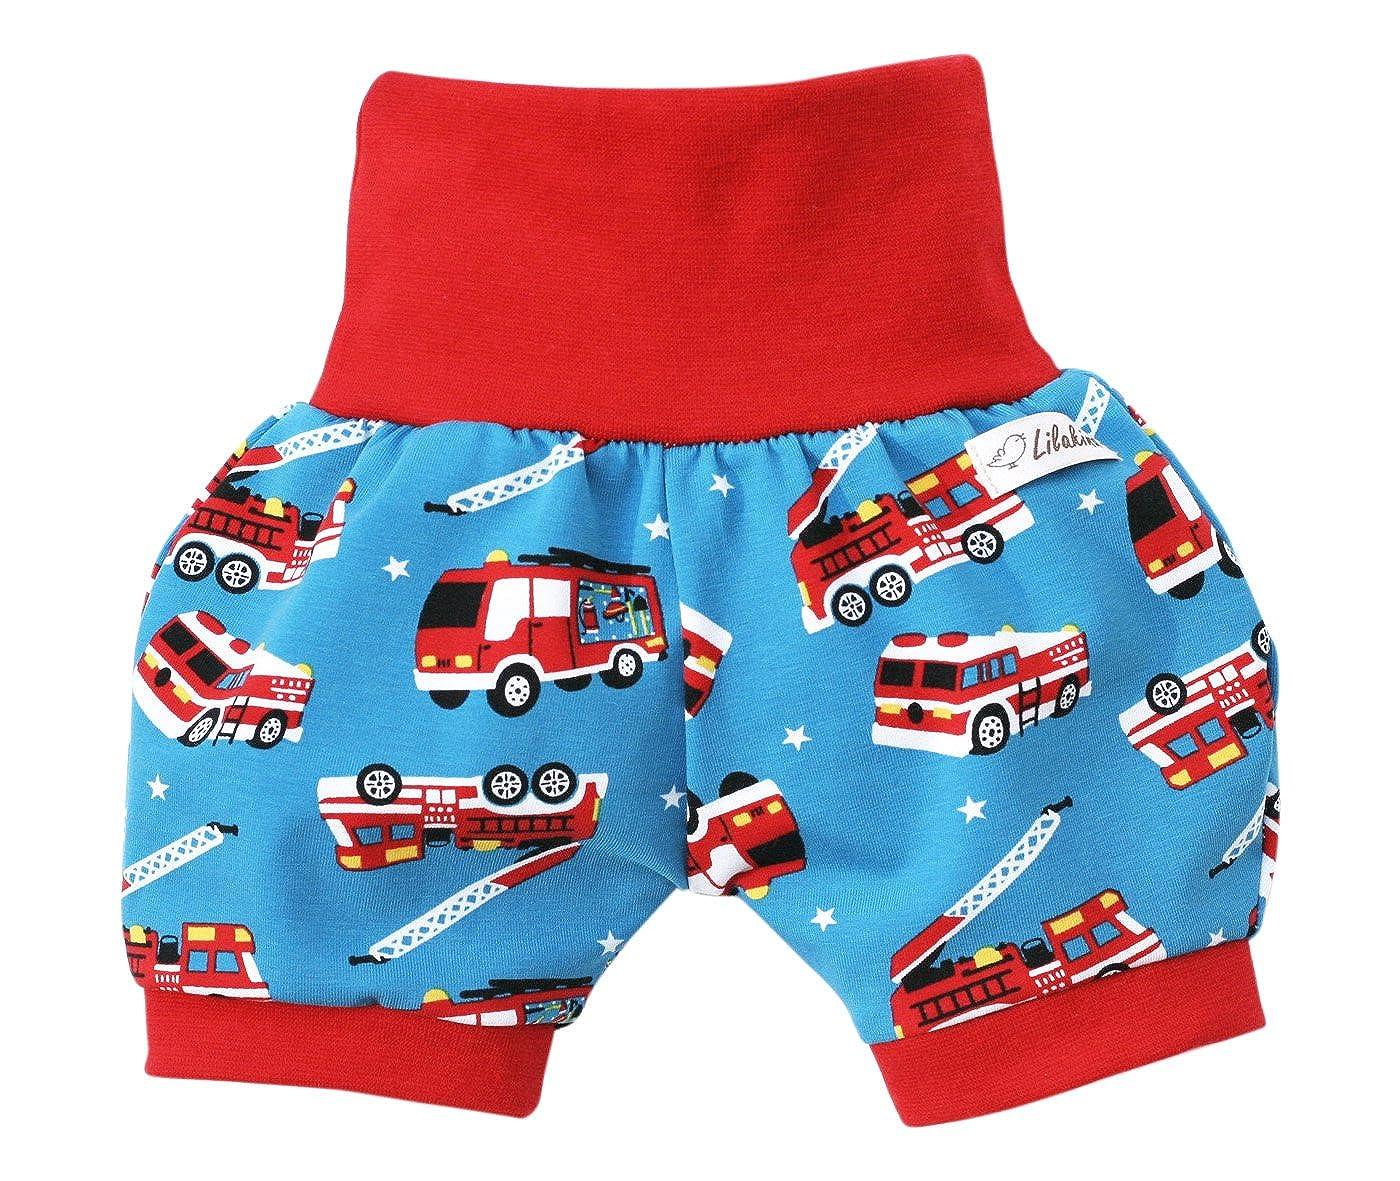 Lilakind Kurze Jungen Pumphose Shorts Buxe Sommerhose Feuerwehr Made in Germany